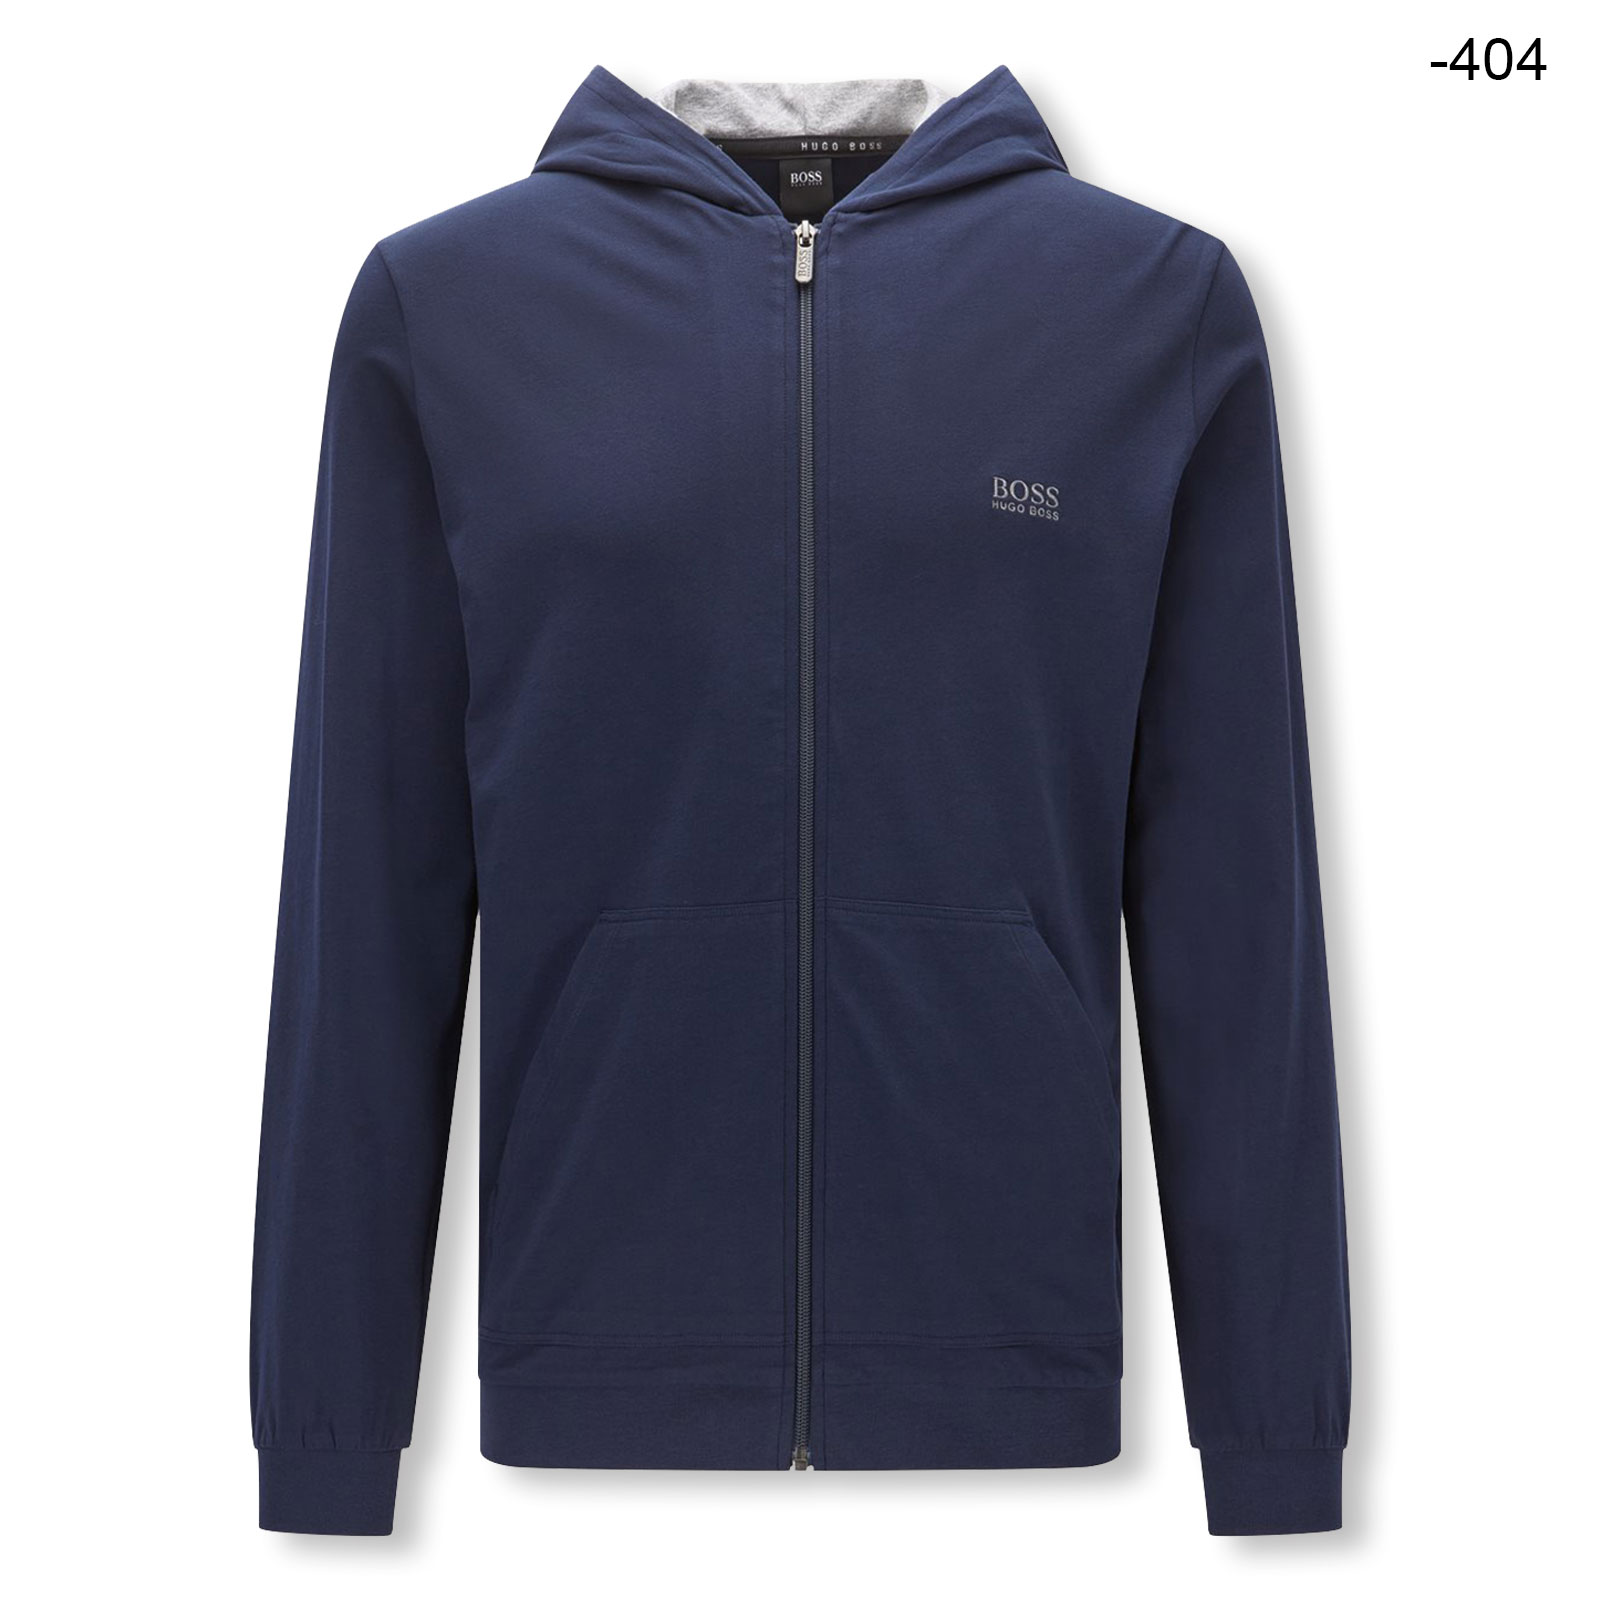 sweatjacke jacket hooded homewear farbwahl herren. Black Bedroom Furniture Sets. Home Design Ideas